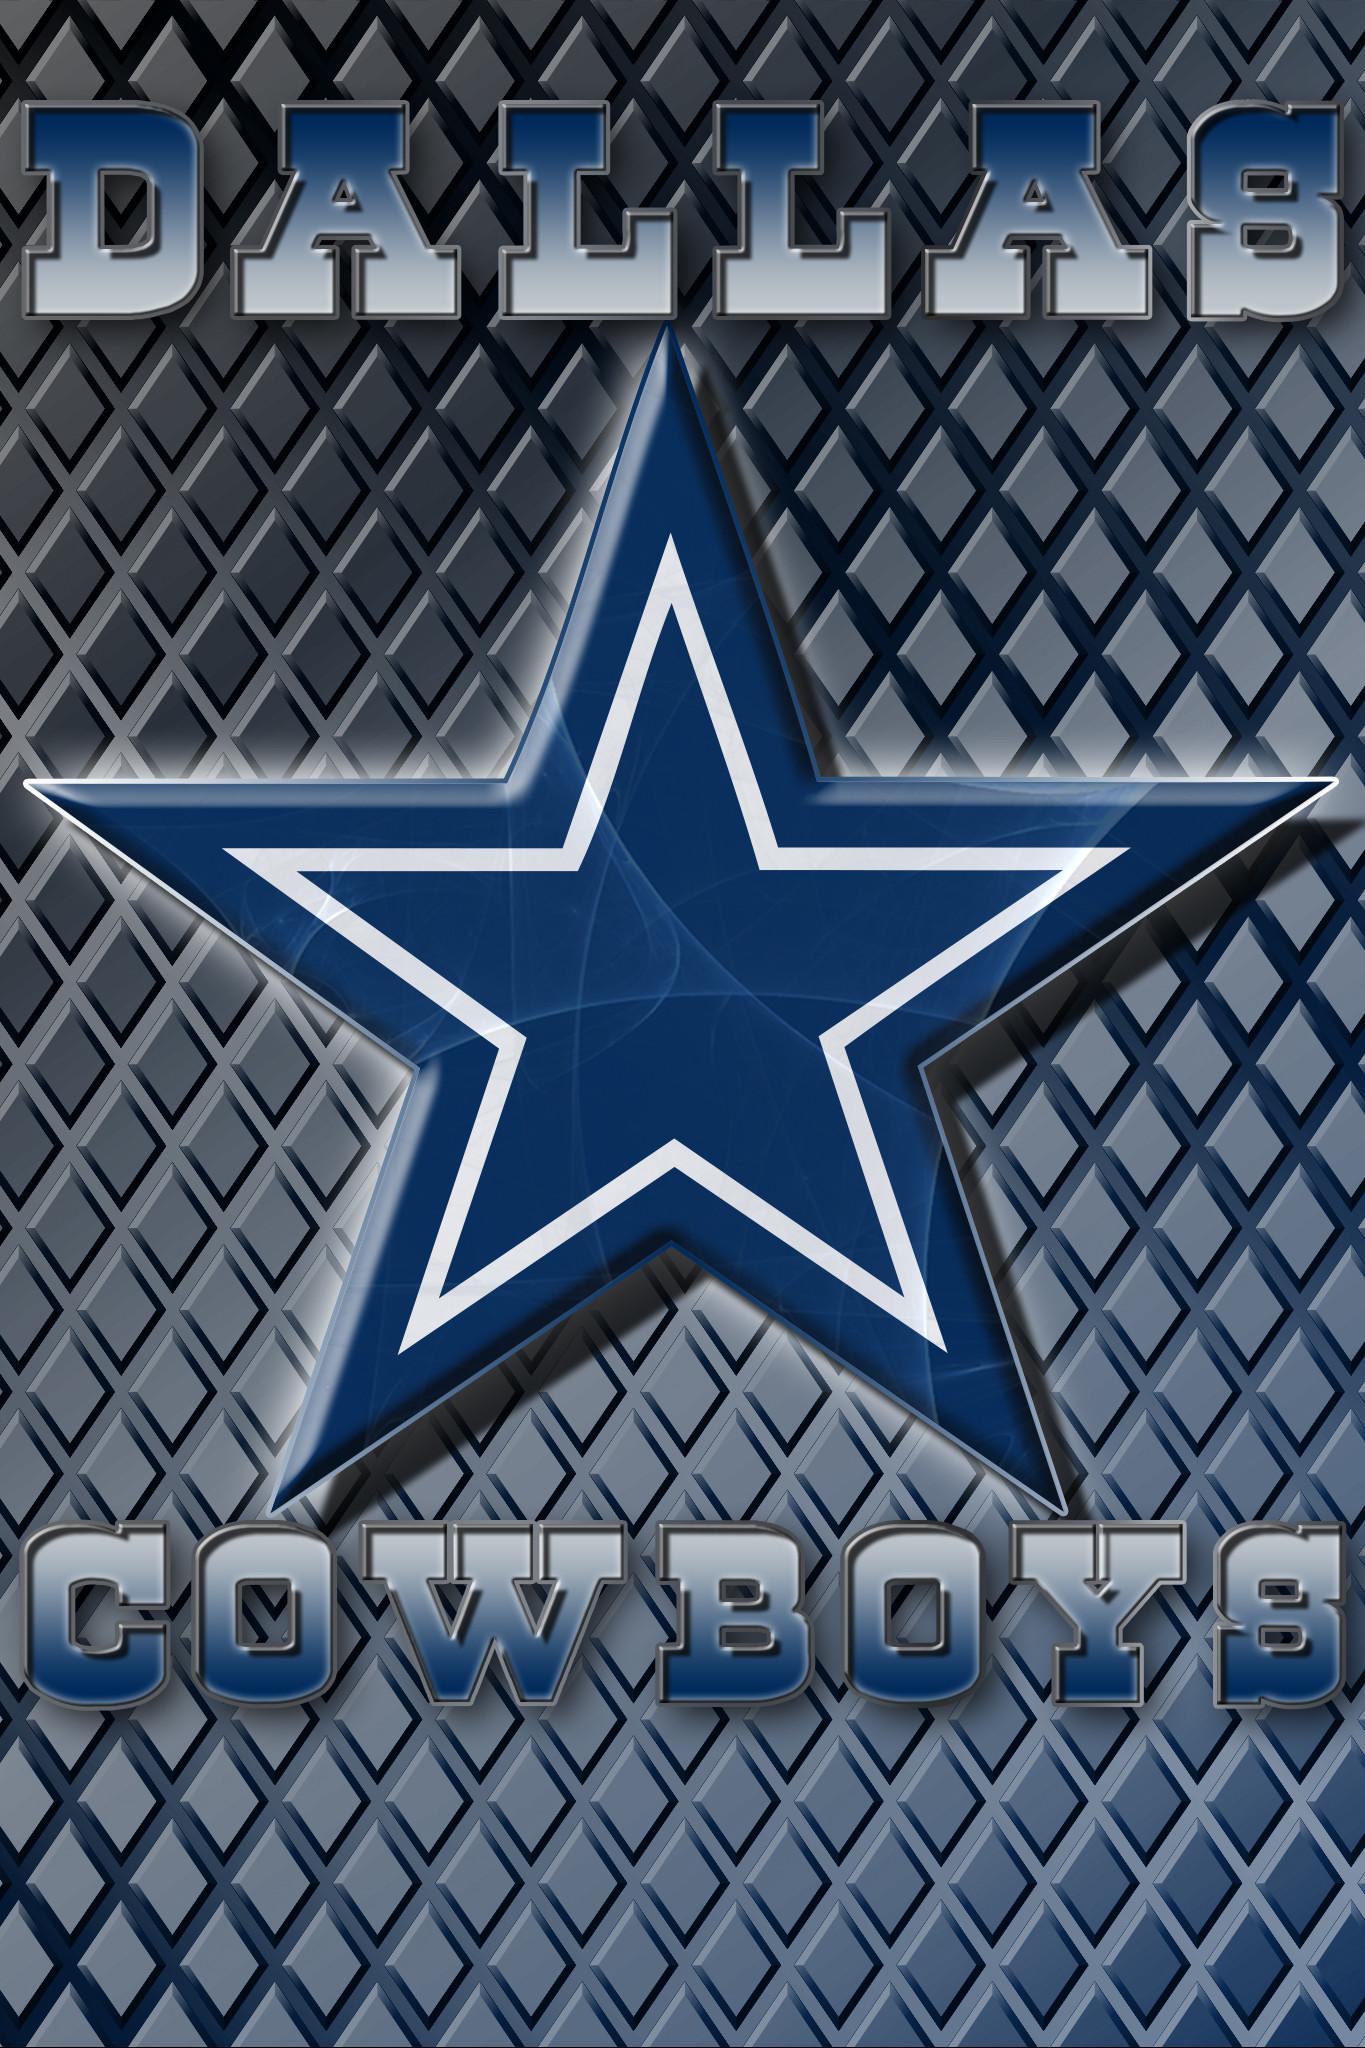 Wallpapers By Wicked Shadows: Dallas Cowboys Logo Wallpaper